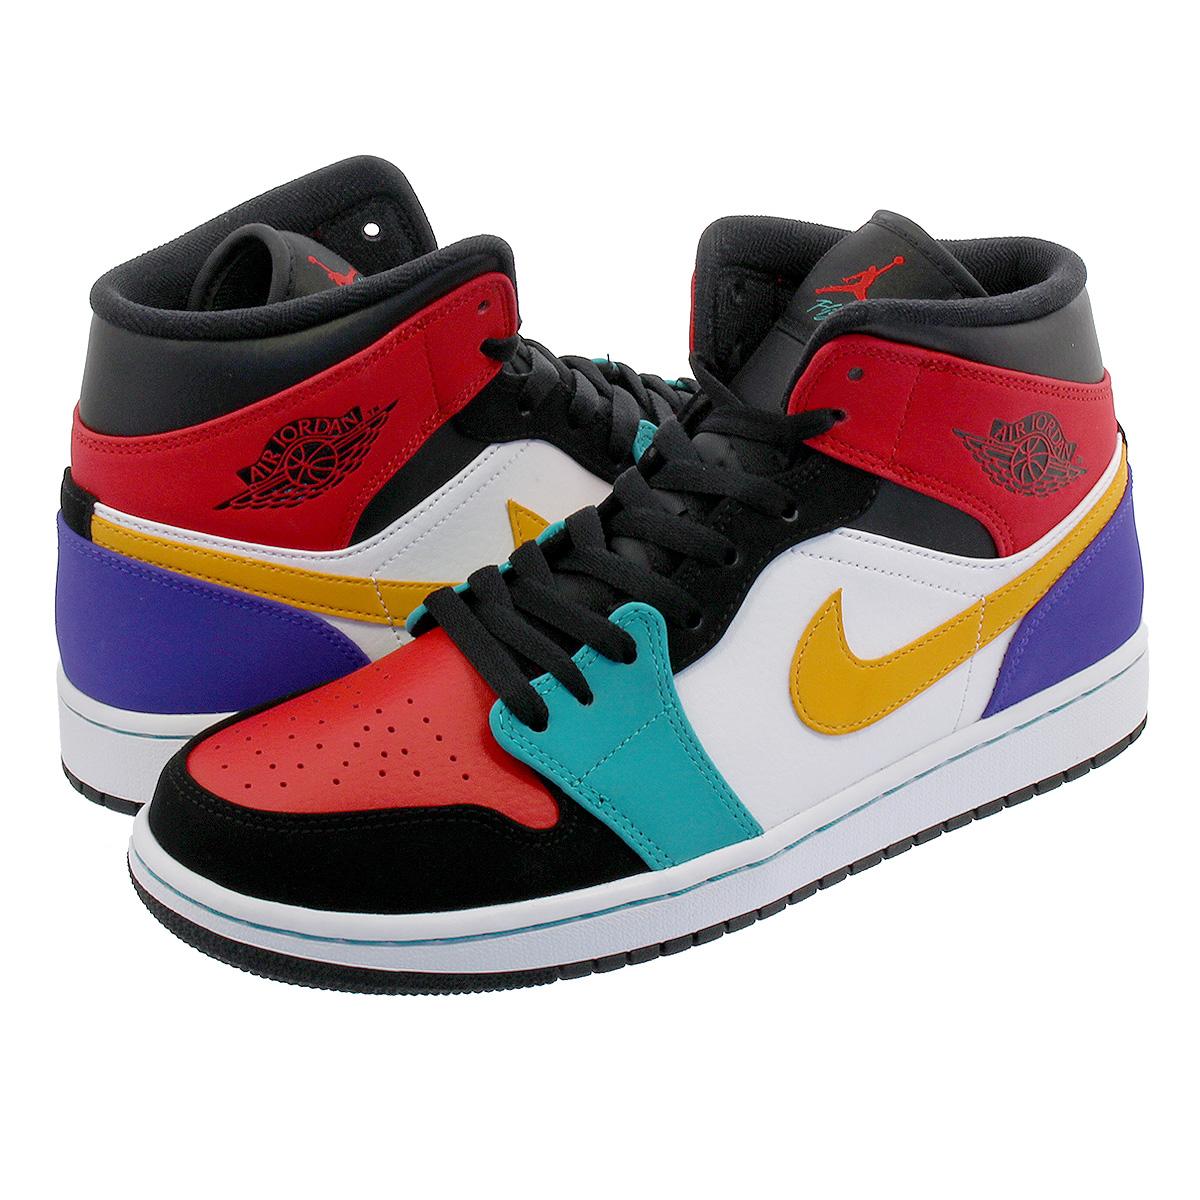 bcffc40c9459b0 LOWTEX BIG-SMALL SHOP  NIKE AIR JORDAN 1 MID Nike Air Jordan 1 mid ...